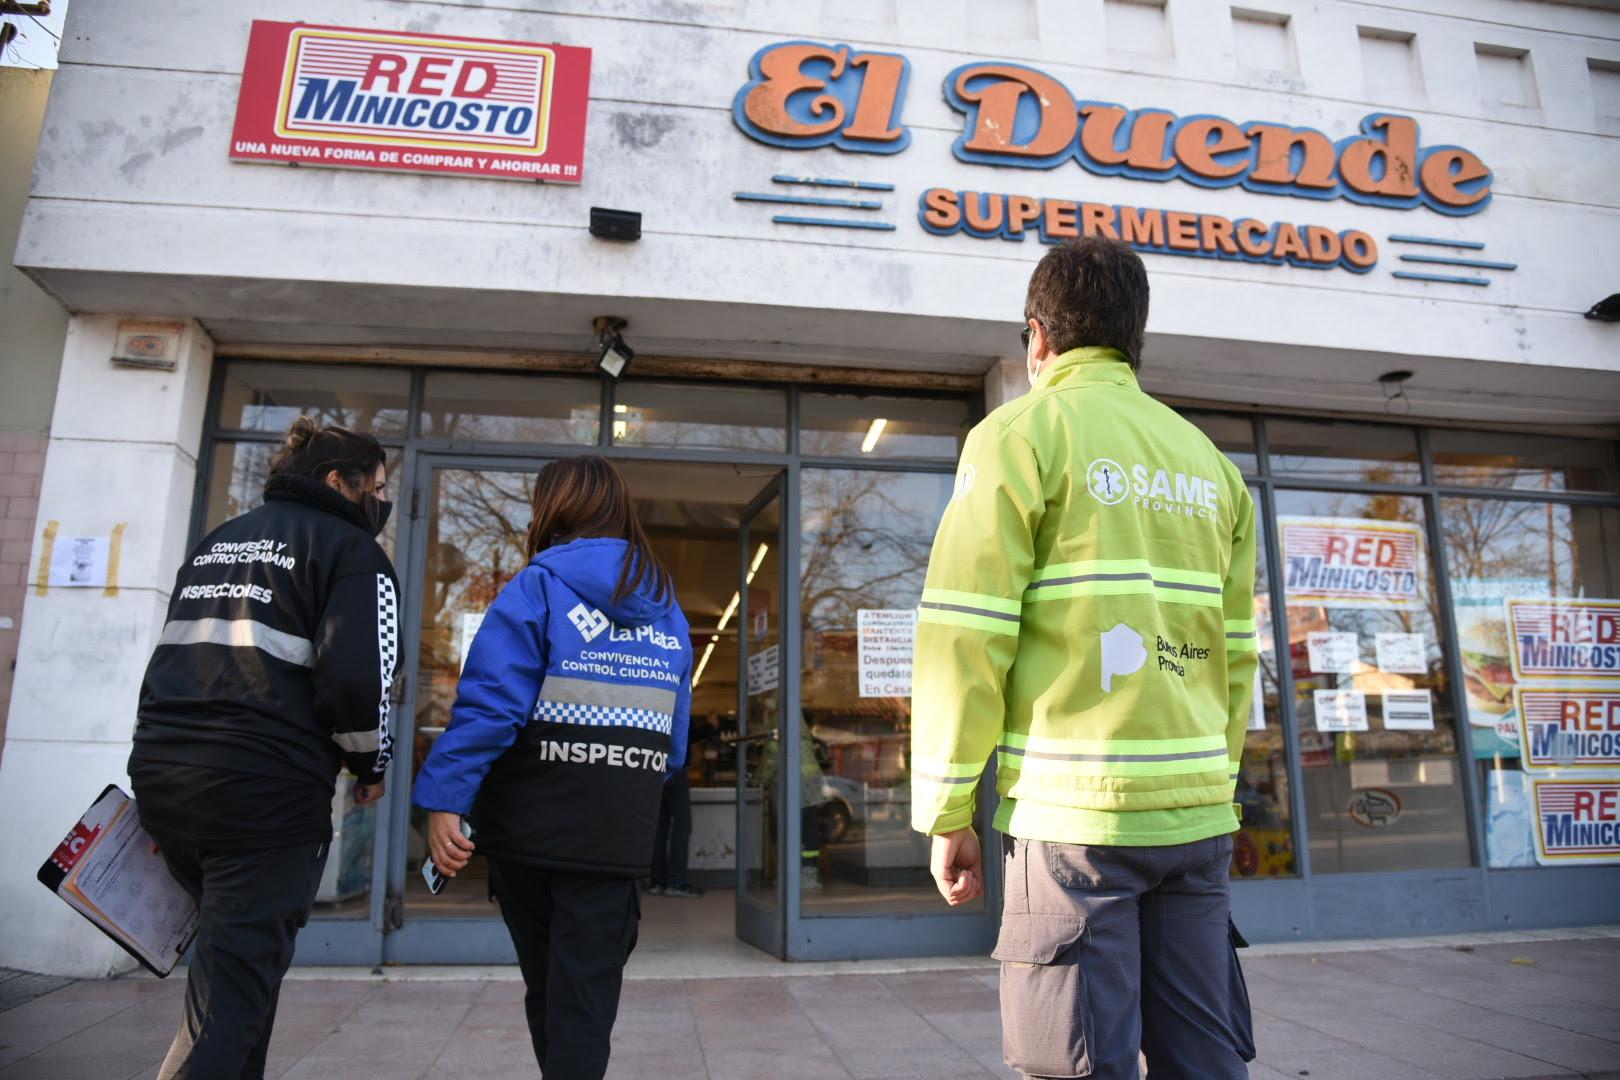 La Plata: Se confirmó un caso de Coronavirus en un supermercado de Tolosa